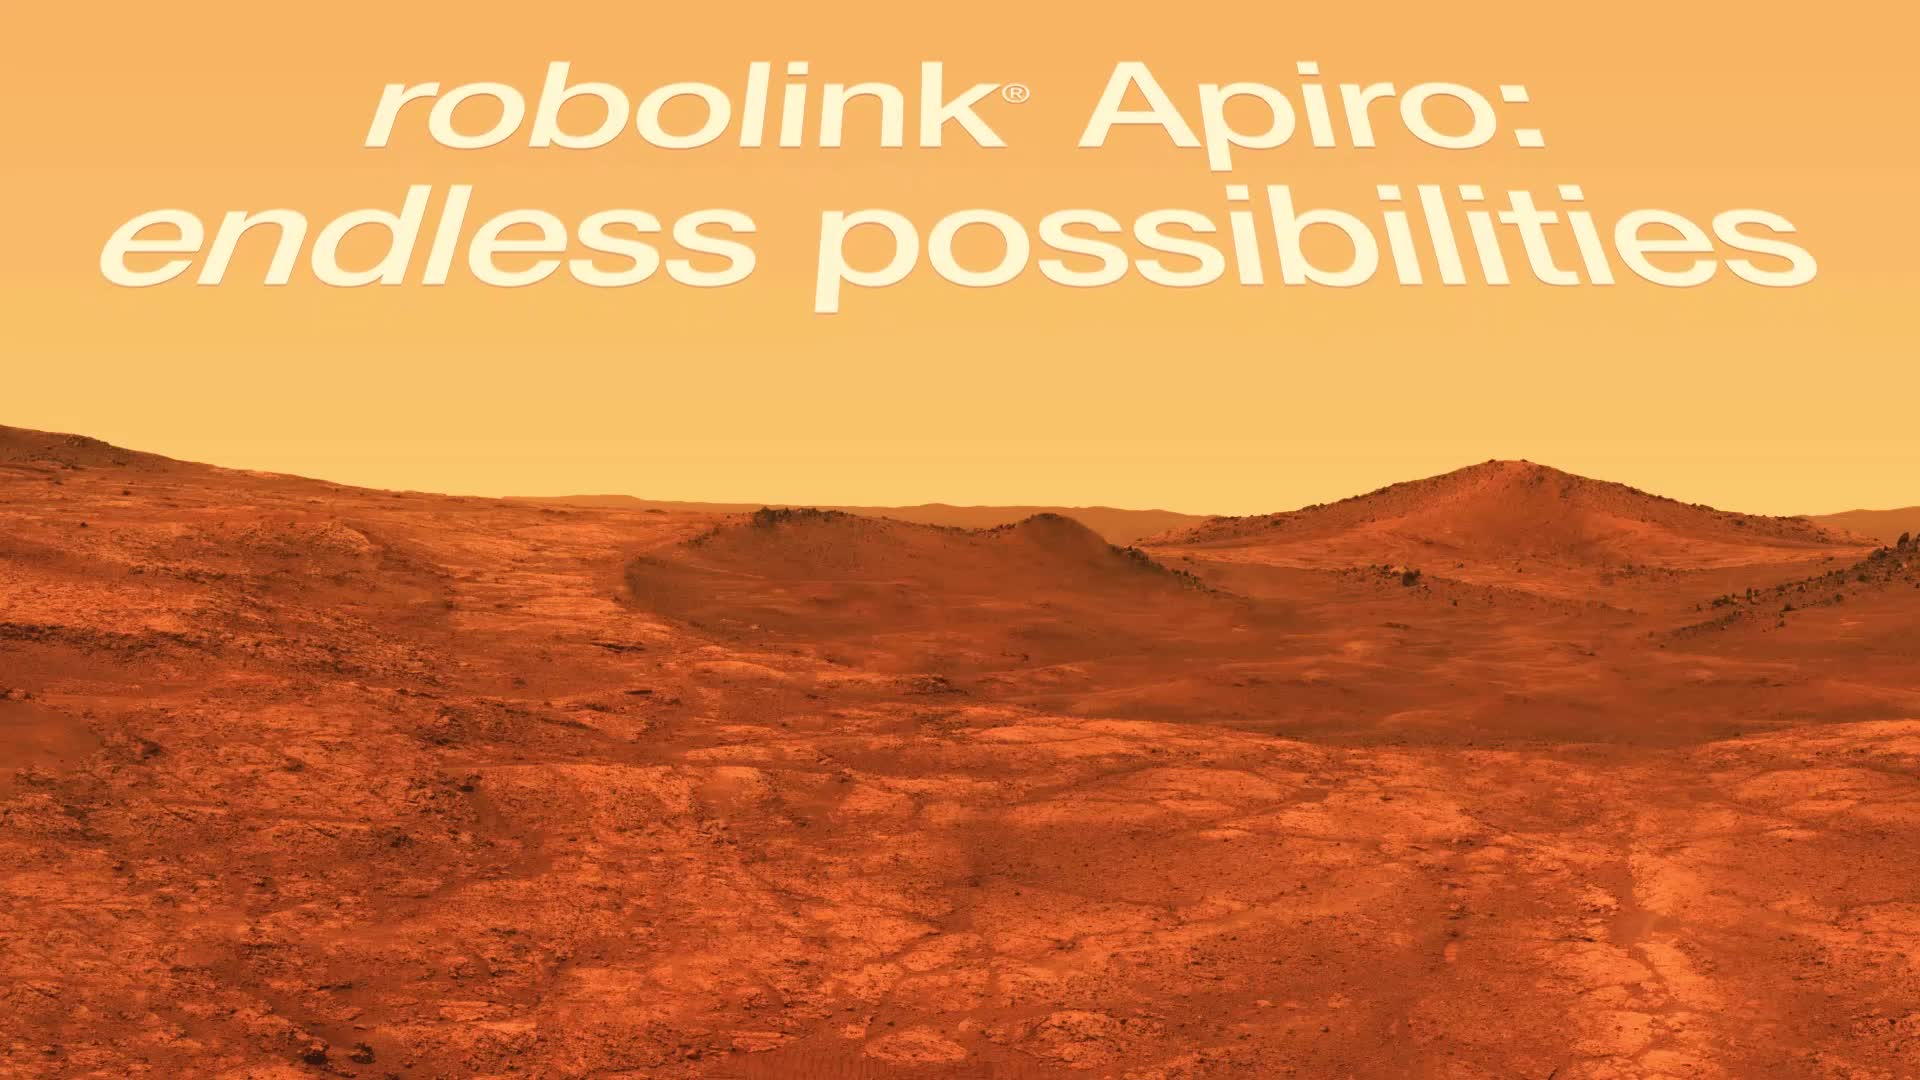 robolink® Apiro